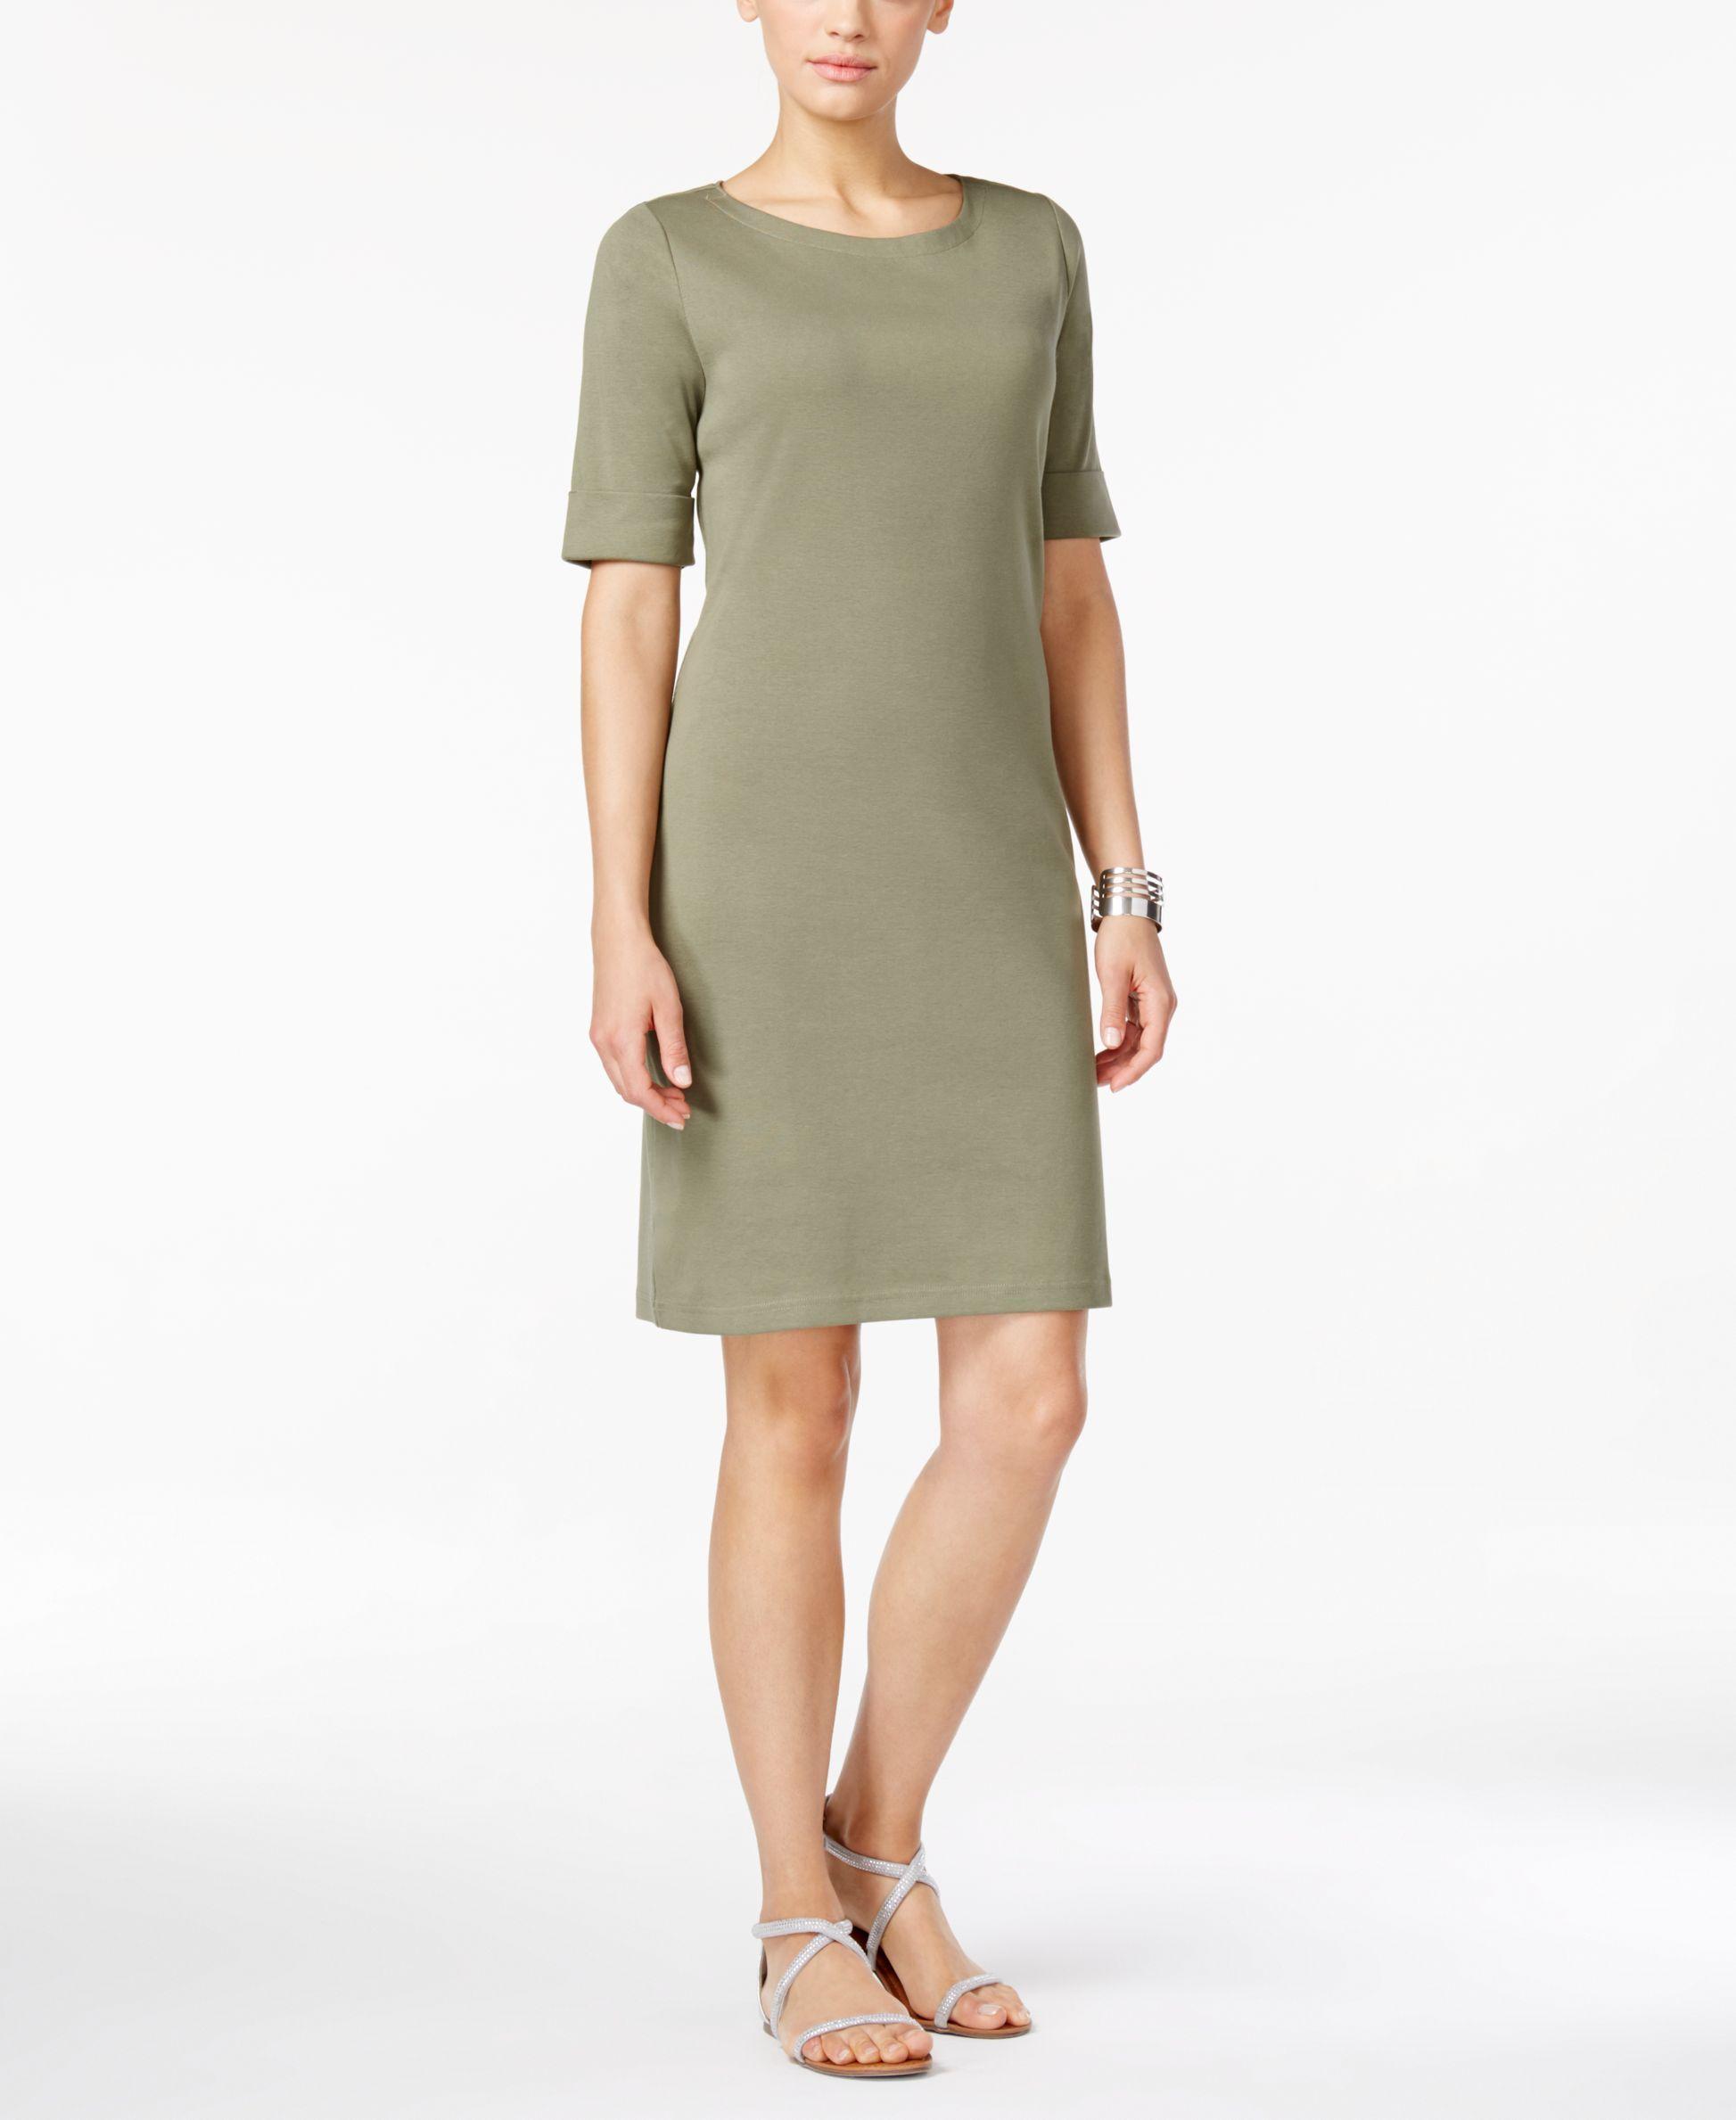 Karen scott tshirt dress created for macyus karen scott short